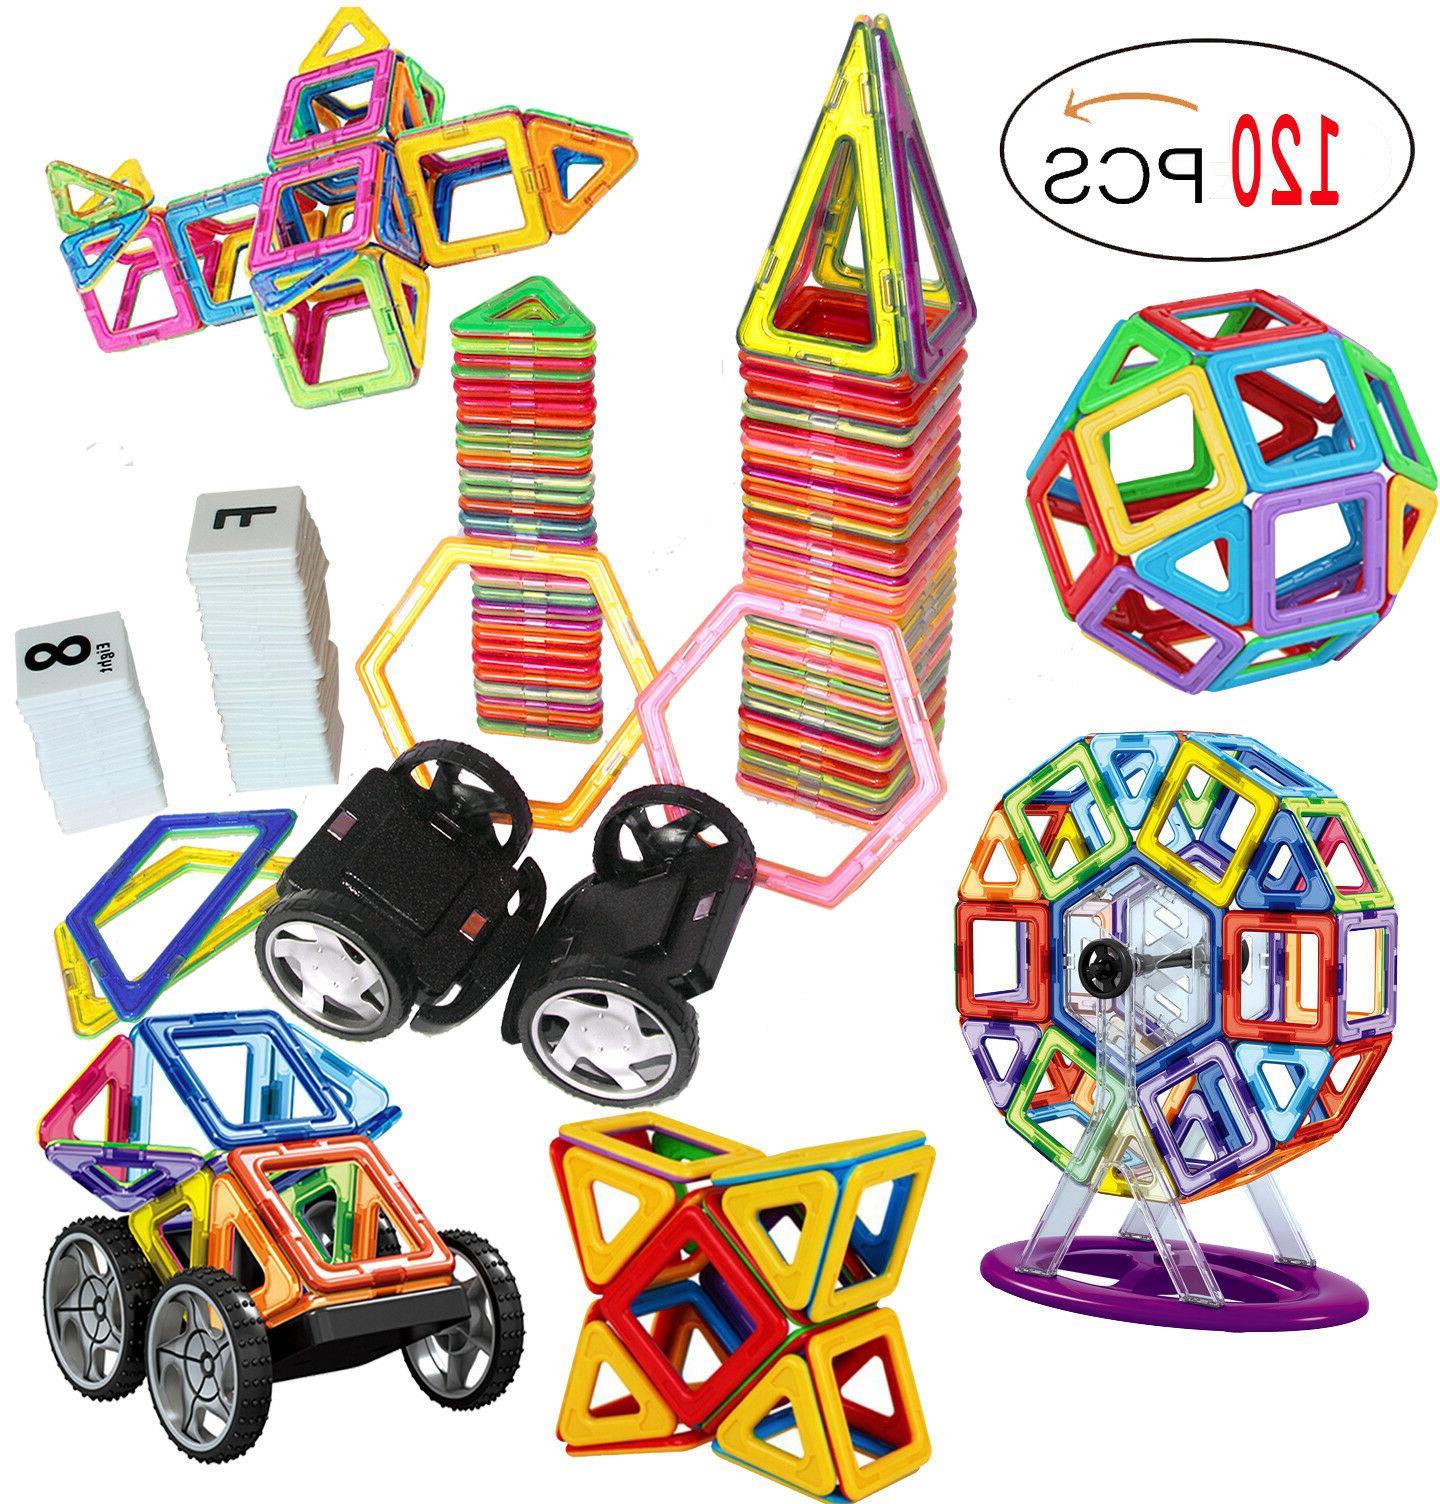 120 Piece Magnetic Tiles magnetic Building Blocks Toys for K